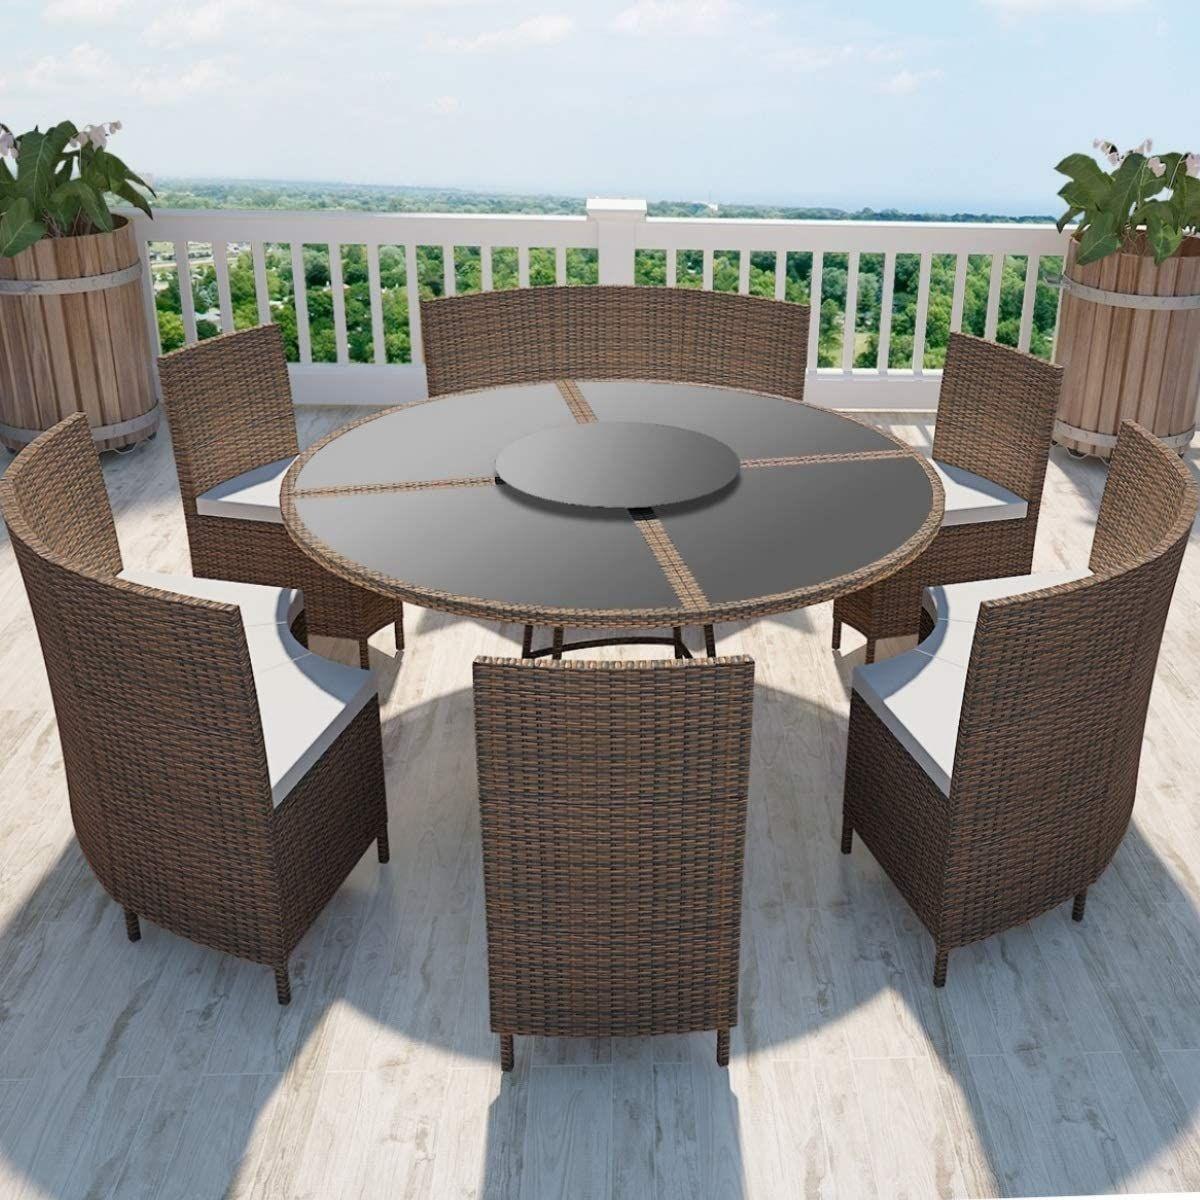 Salon De Jardin Circulaire 12 Places En 2020 Mobilier Jardin Meubles De Patio En Osier Table De Patio Ronde